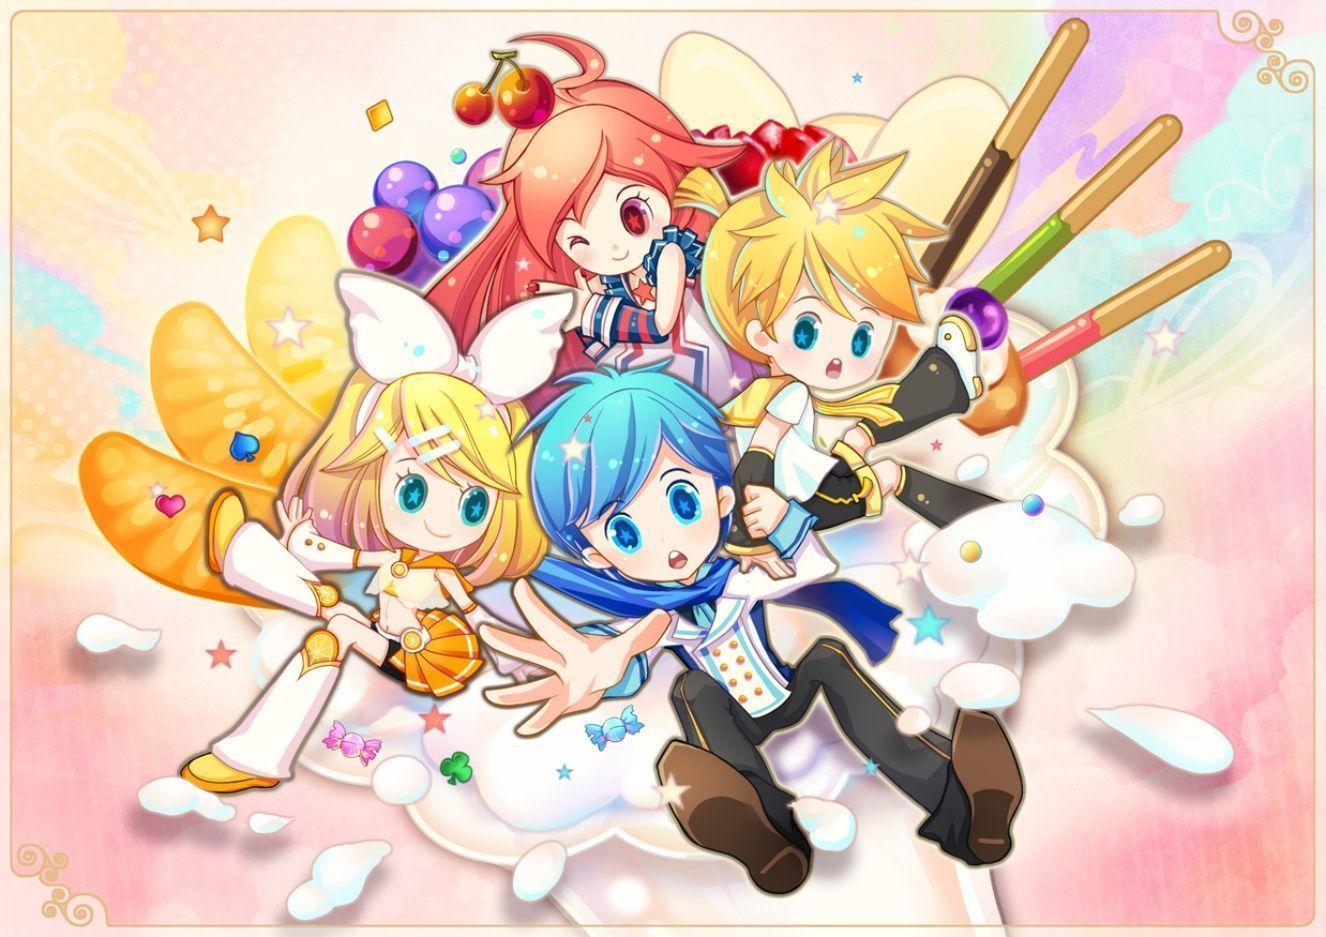 Vocaloid Chibi Group Wallpaper Anime Chibi Wallpapers...